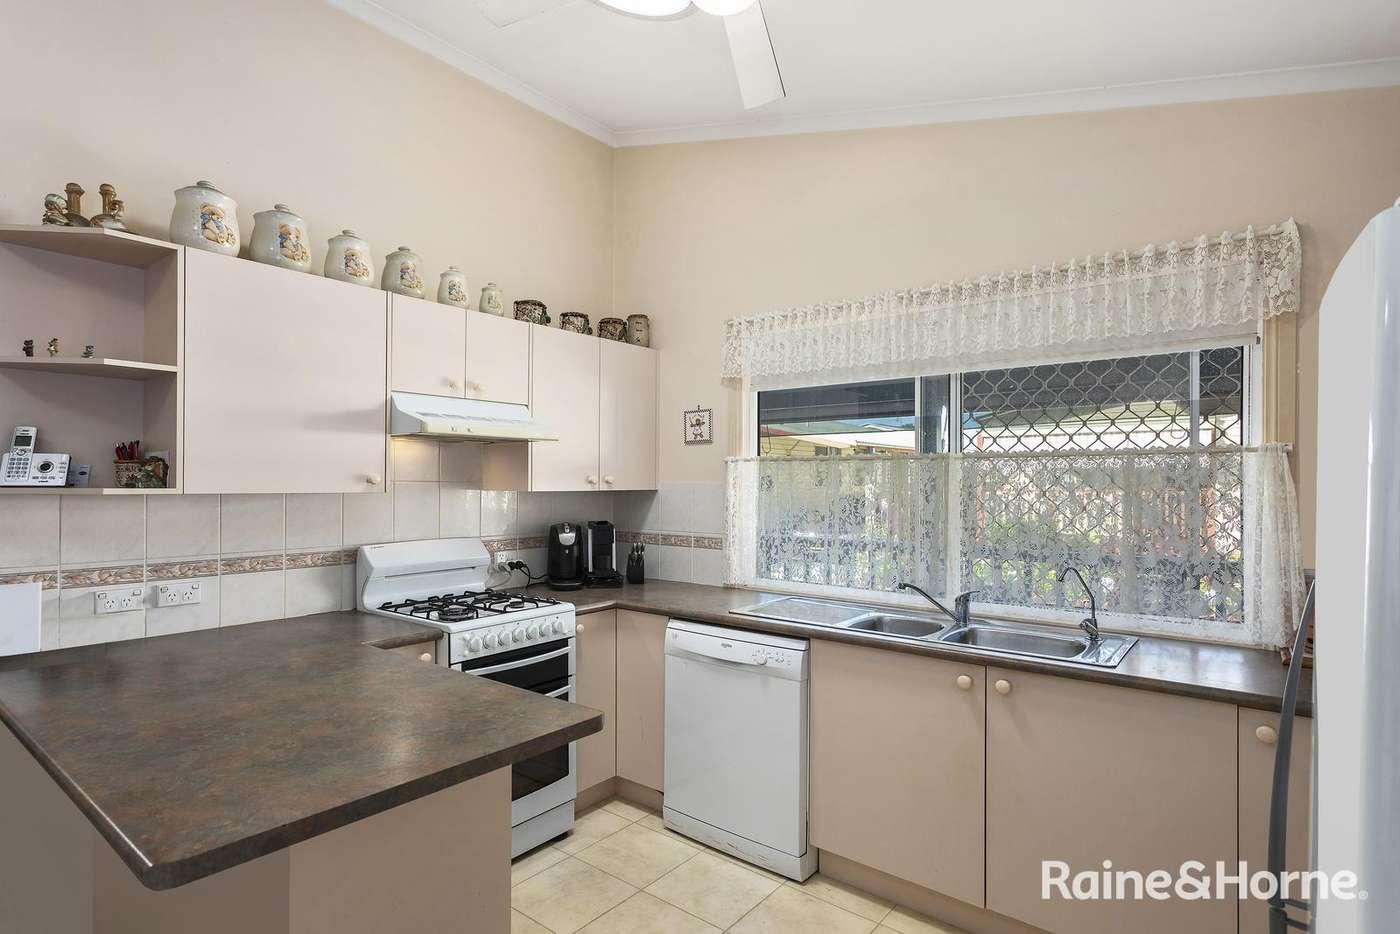 Seventh view of Homely house listing, 173/186 Sunrise Ave, Halekulani NSW 2262